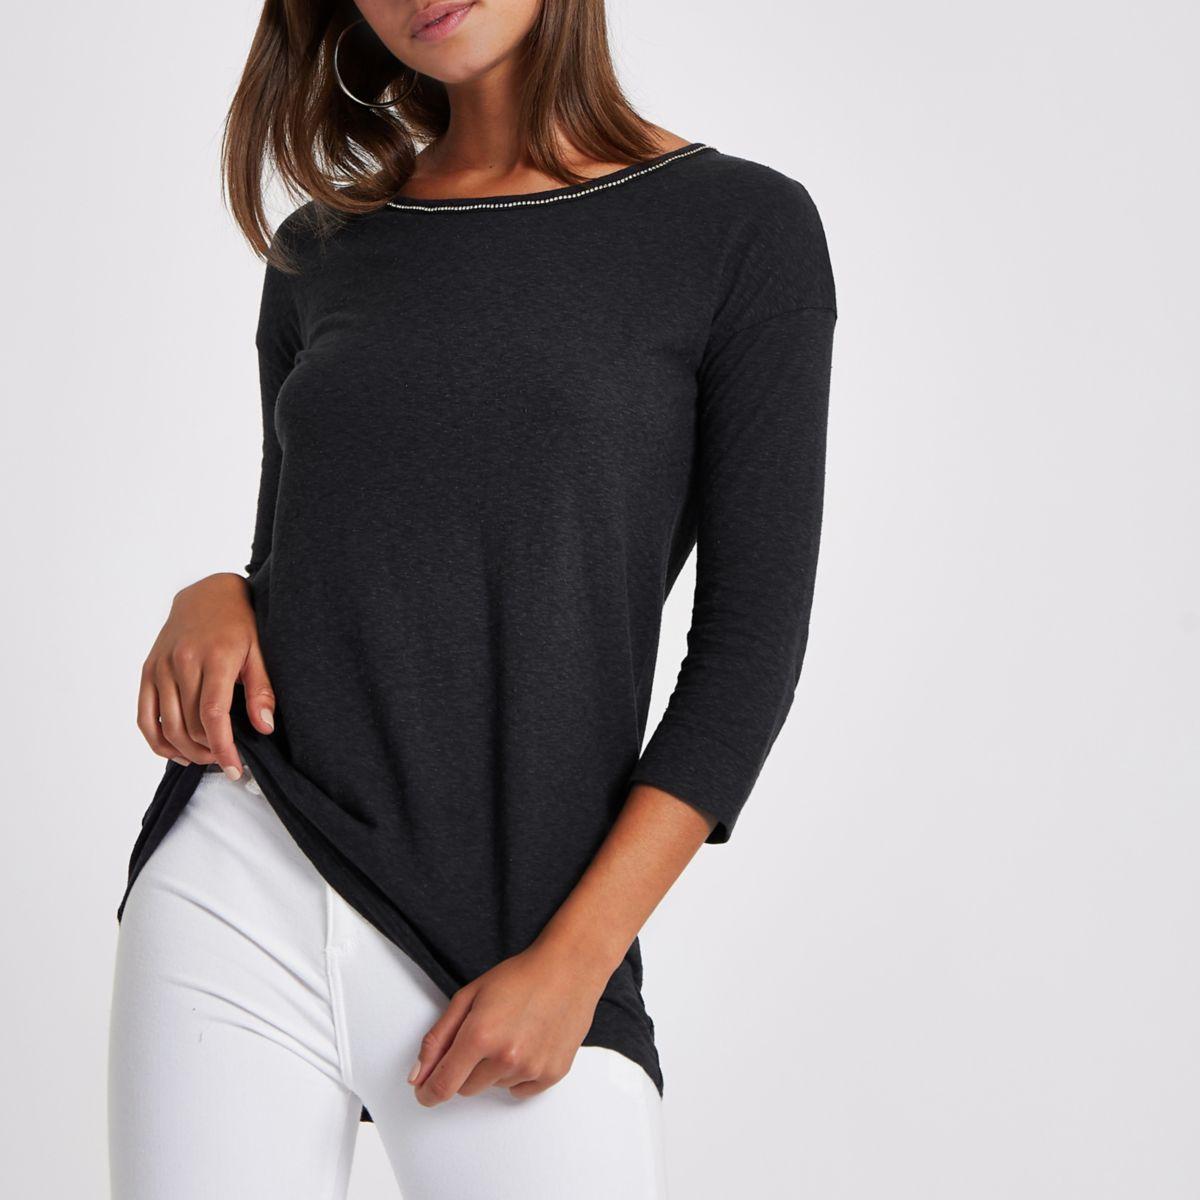 Grey diamante trim embellished T-shirt